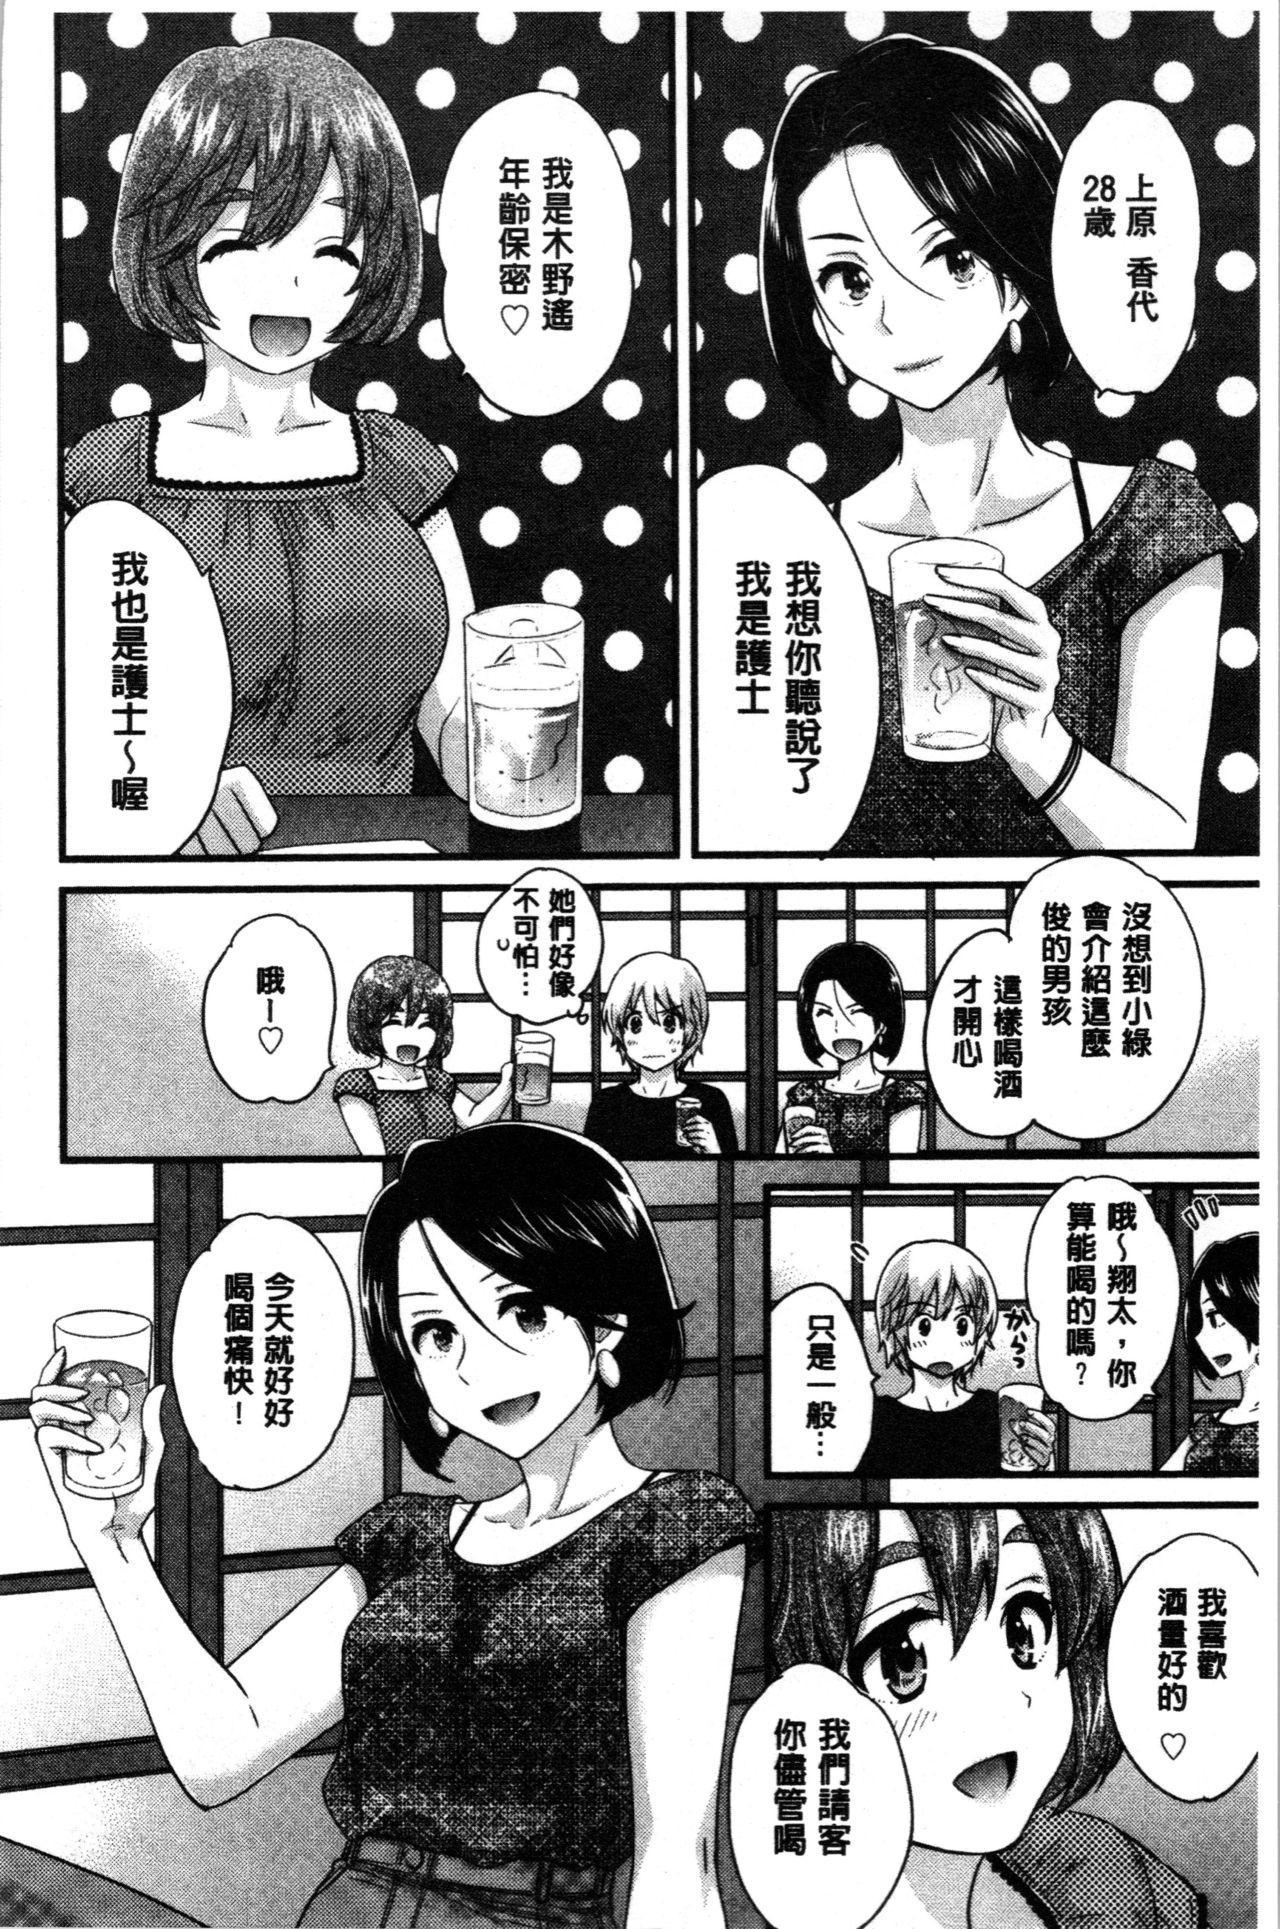 Ottori Midarana Mikami-san   嫻淑優雅又淫亂的三上小姐 85